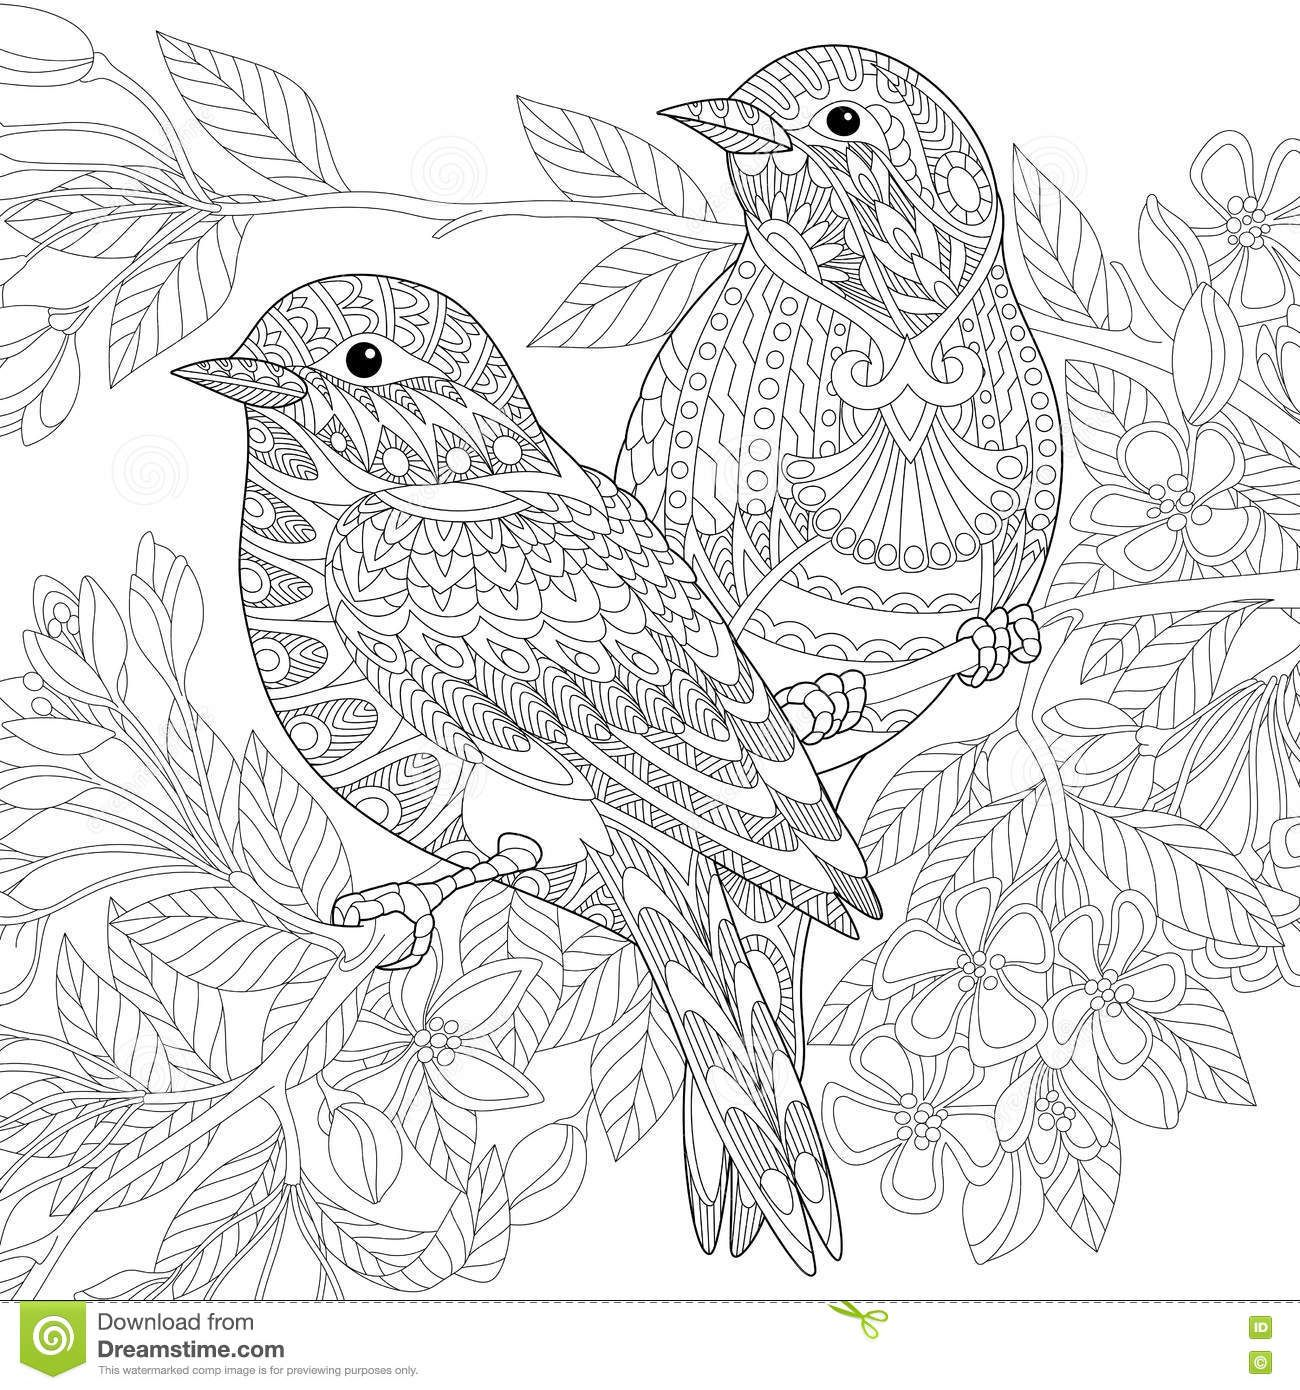 mandala coloring pages birds - photo#37